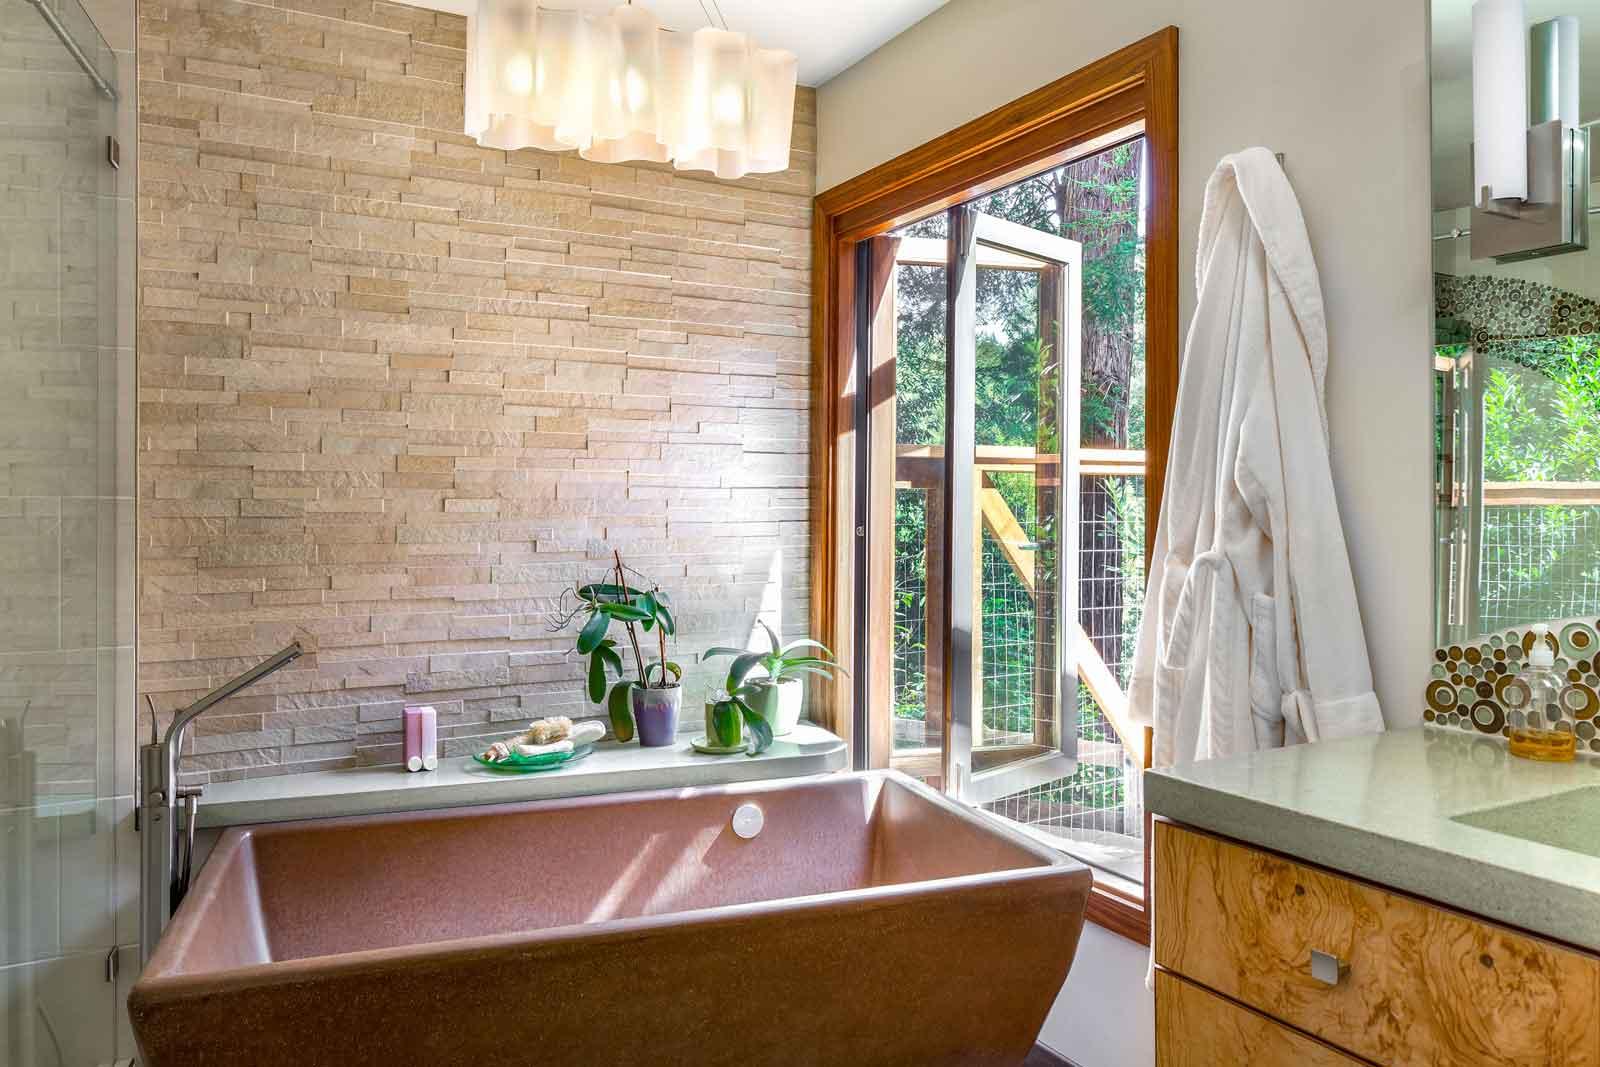 Kobe walnut wood folding window from concrete freestanding tub